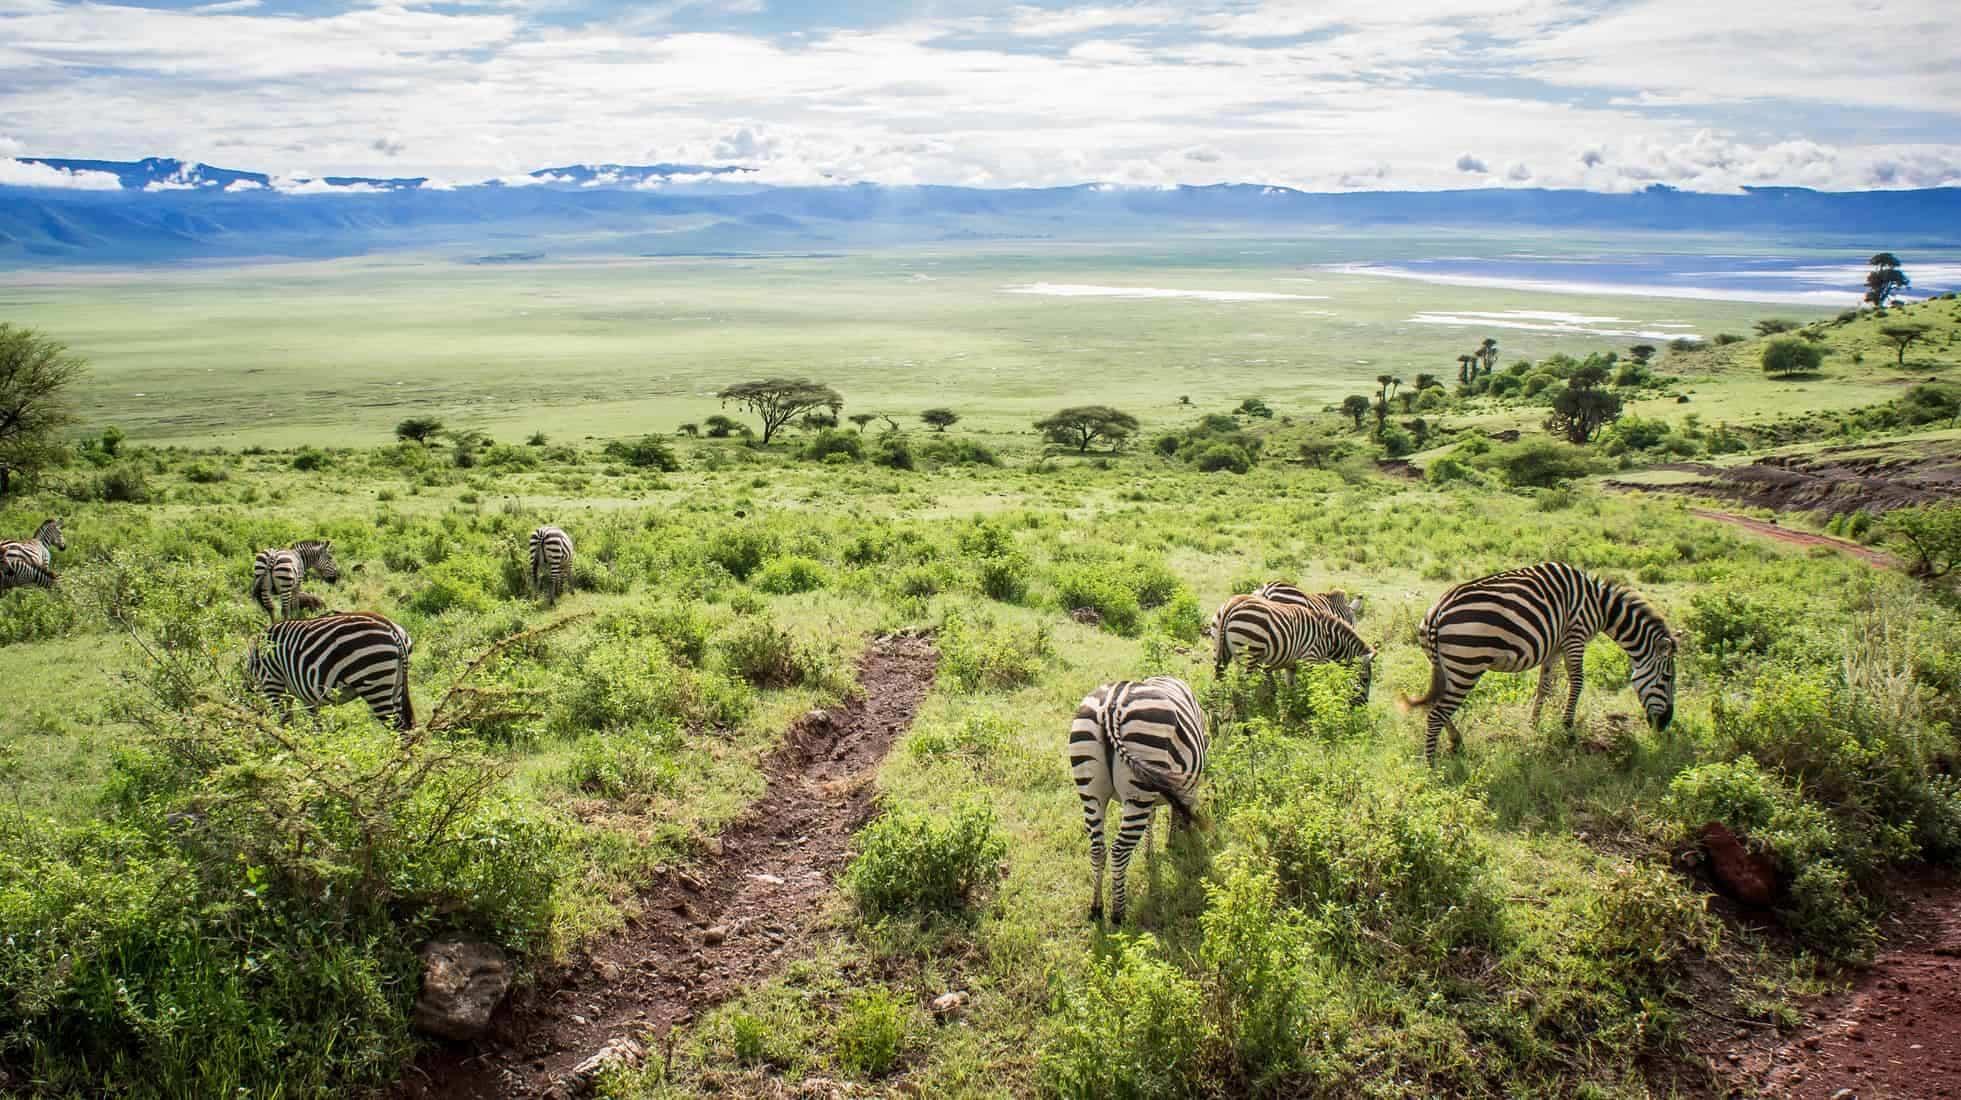 Travel to Africa. This shot of zebras grazing was taken at the Ngorongoro Crater, Tanzania, Africa.